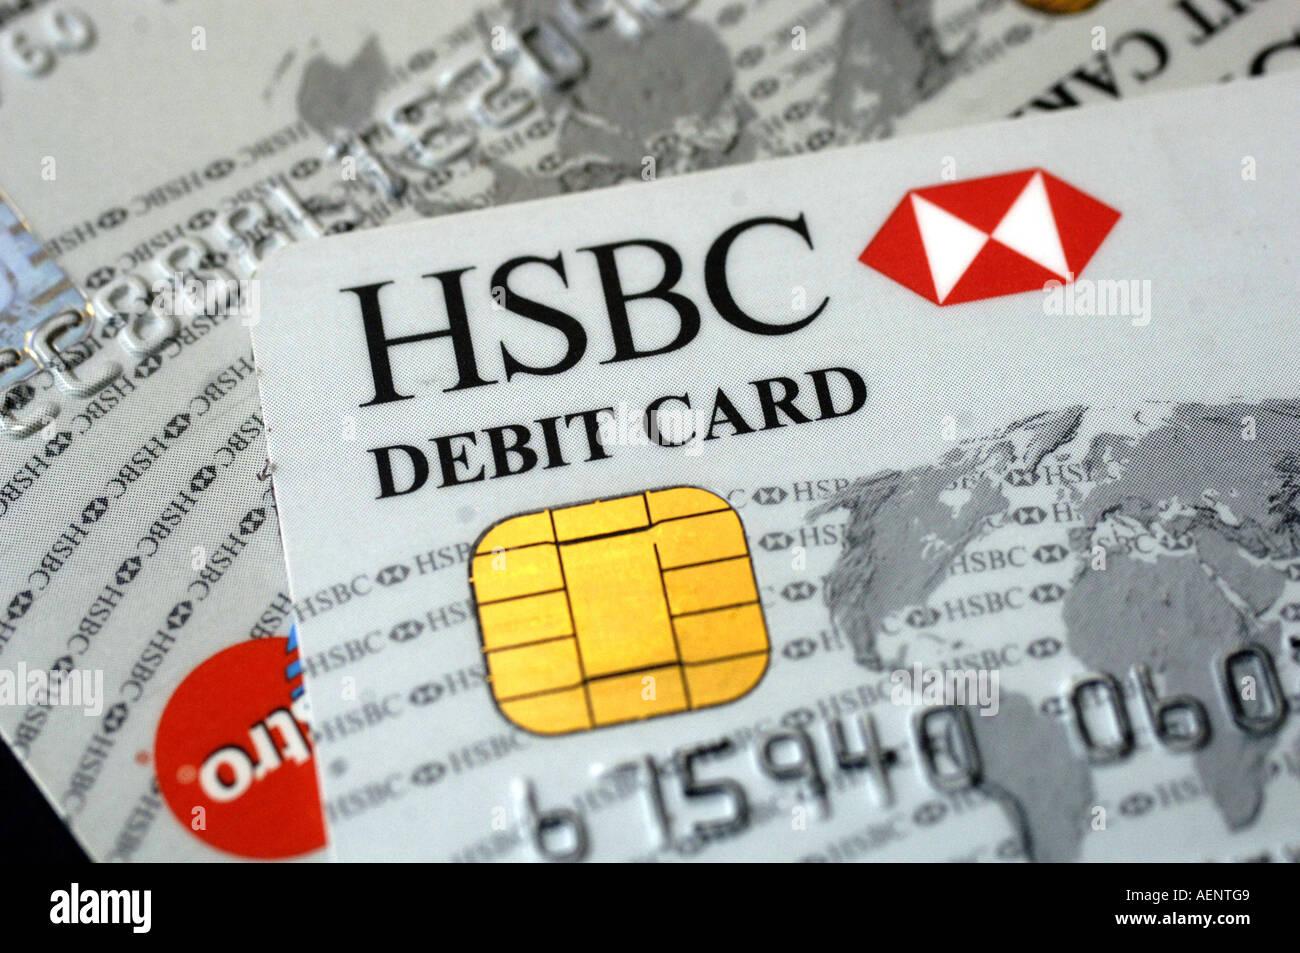 HSBC Debit card Stock Photo: 7844616 - Alamy